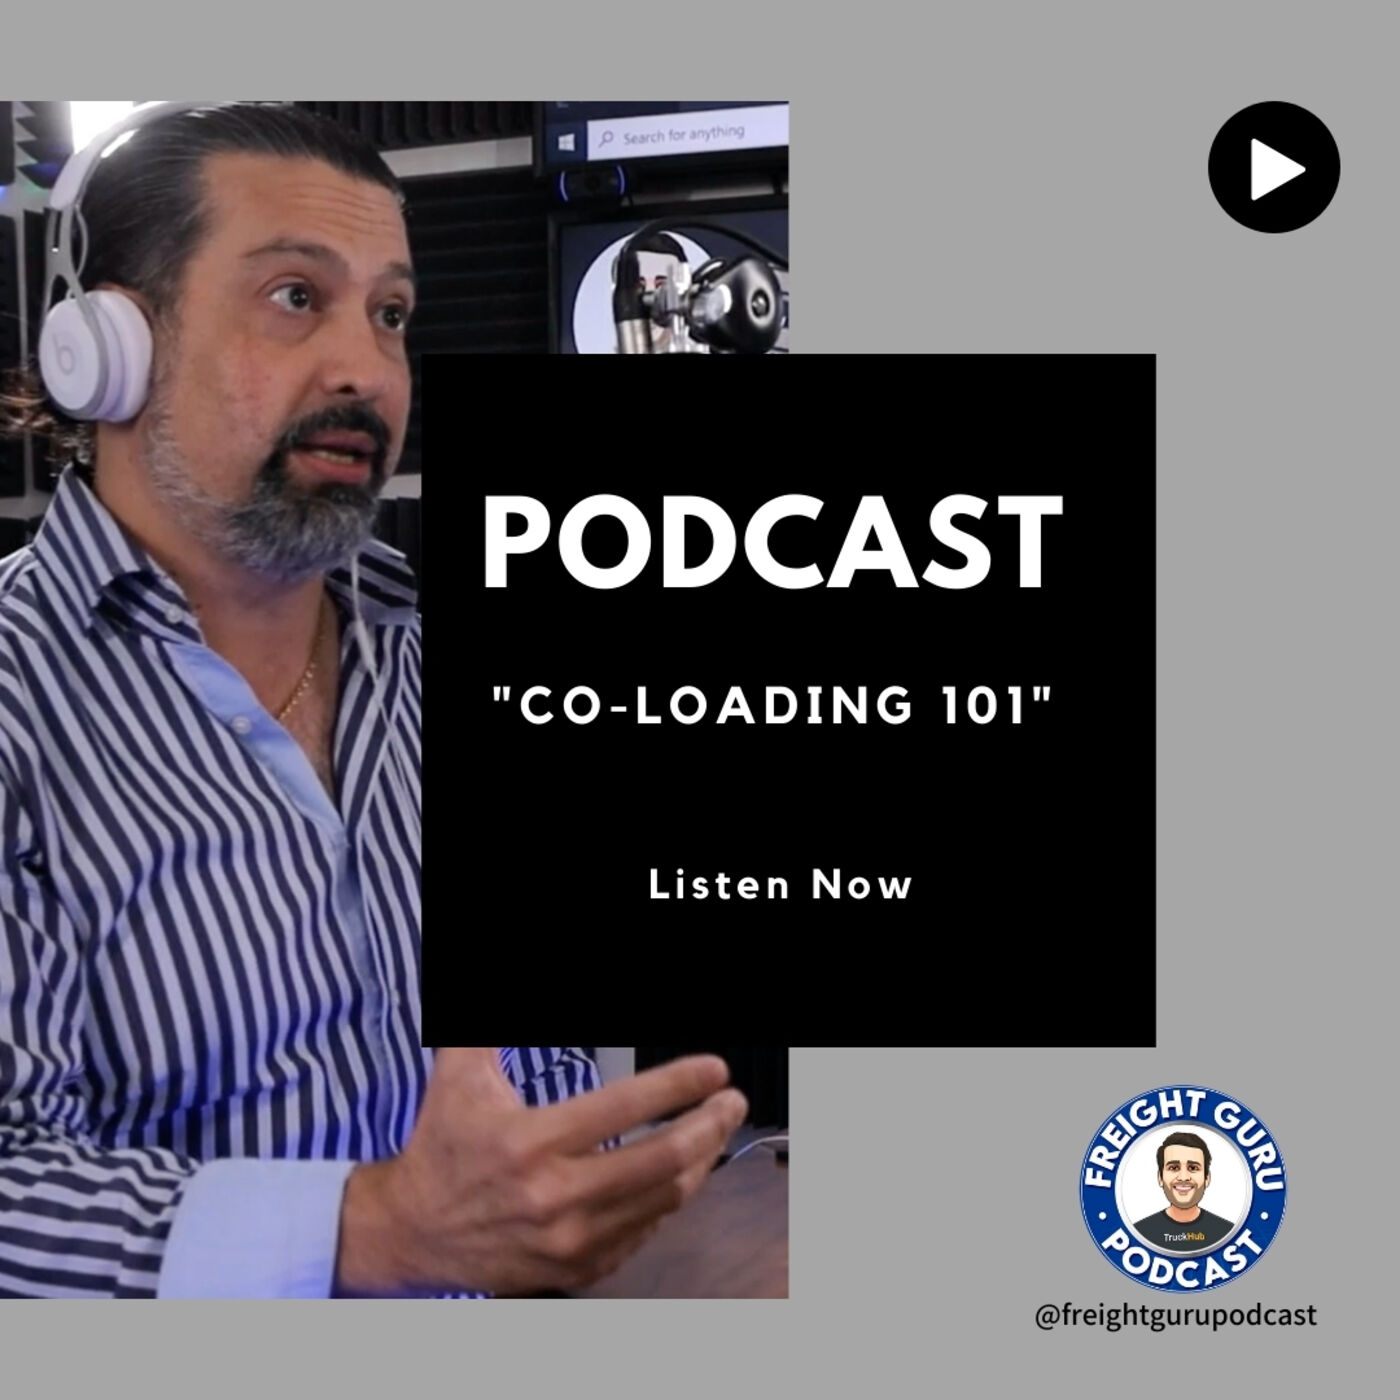 Co-Loading 101 - Freight Guru Podcast Ep. 19